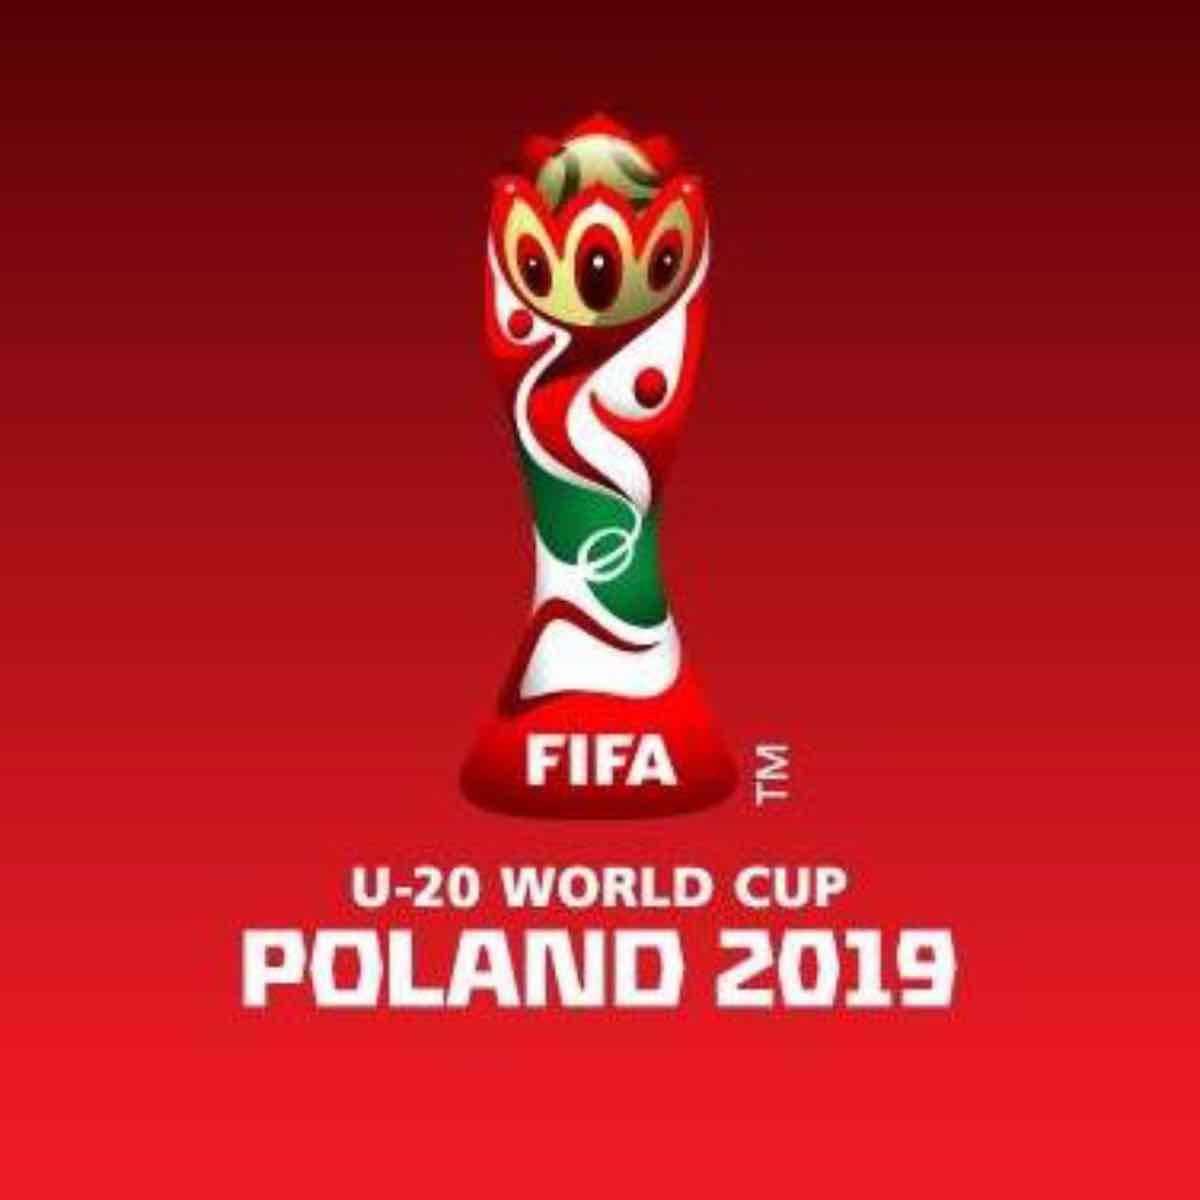 Mondiale U-20 | Ucraina - Italia | Diretta streaming | Partita Live